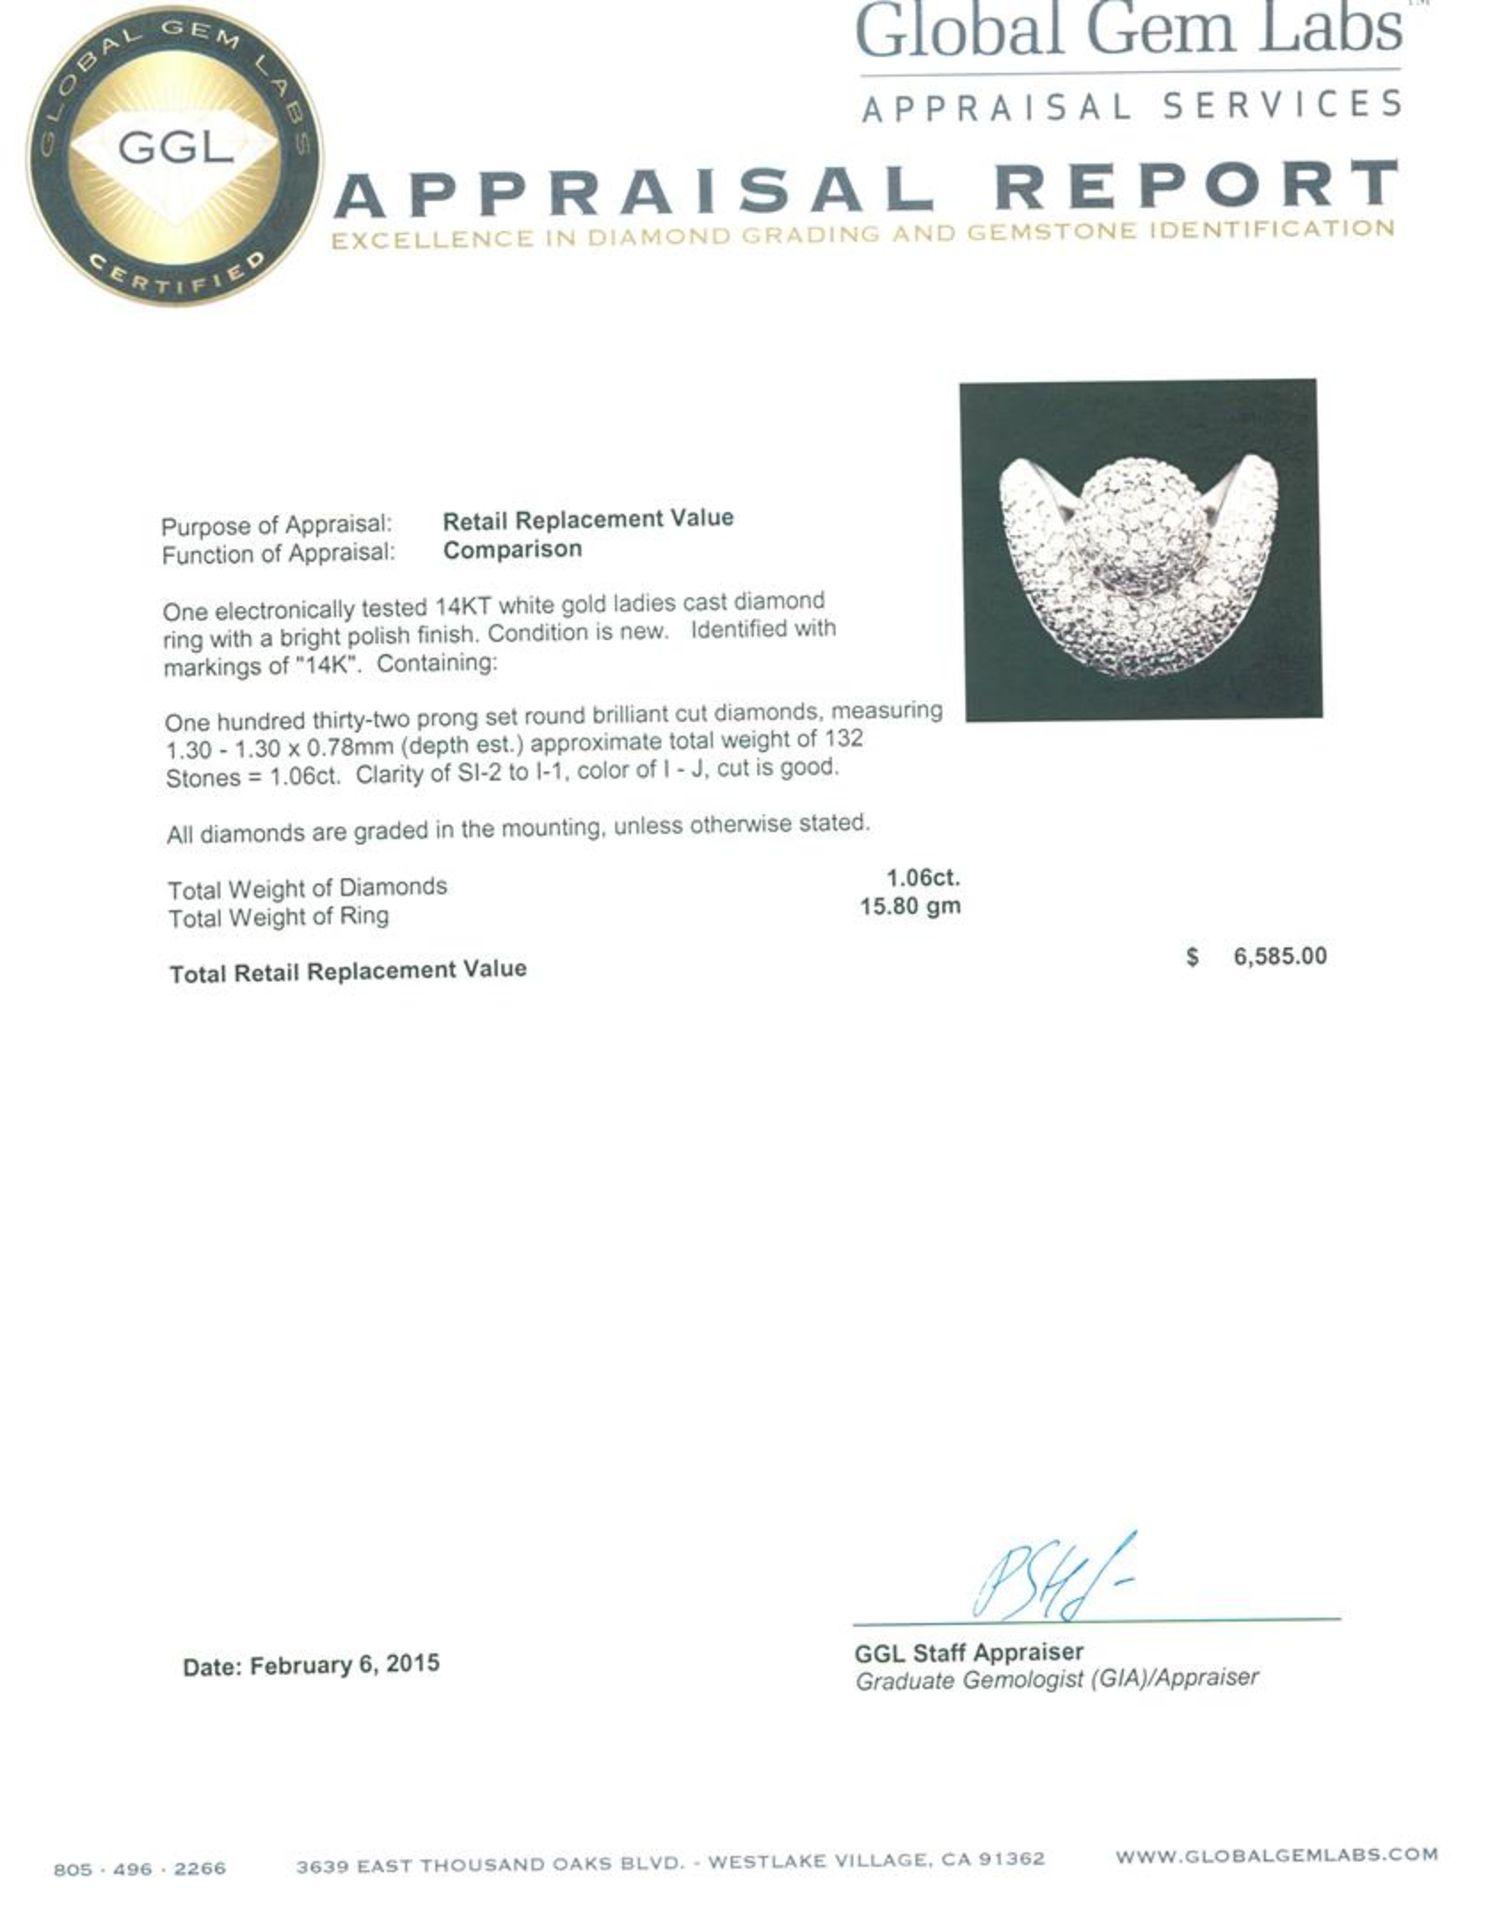 14KT White Gold 1.06 ctw Diamond Ring - Image 5 of 5